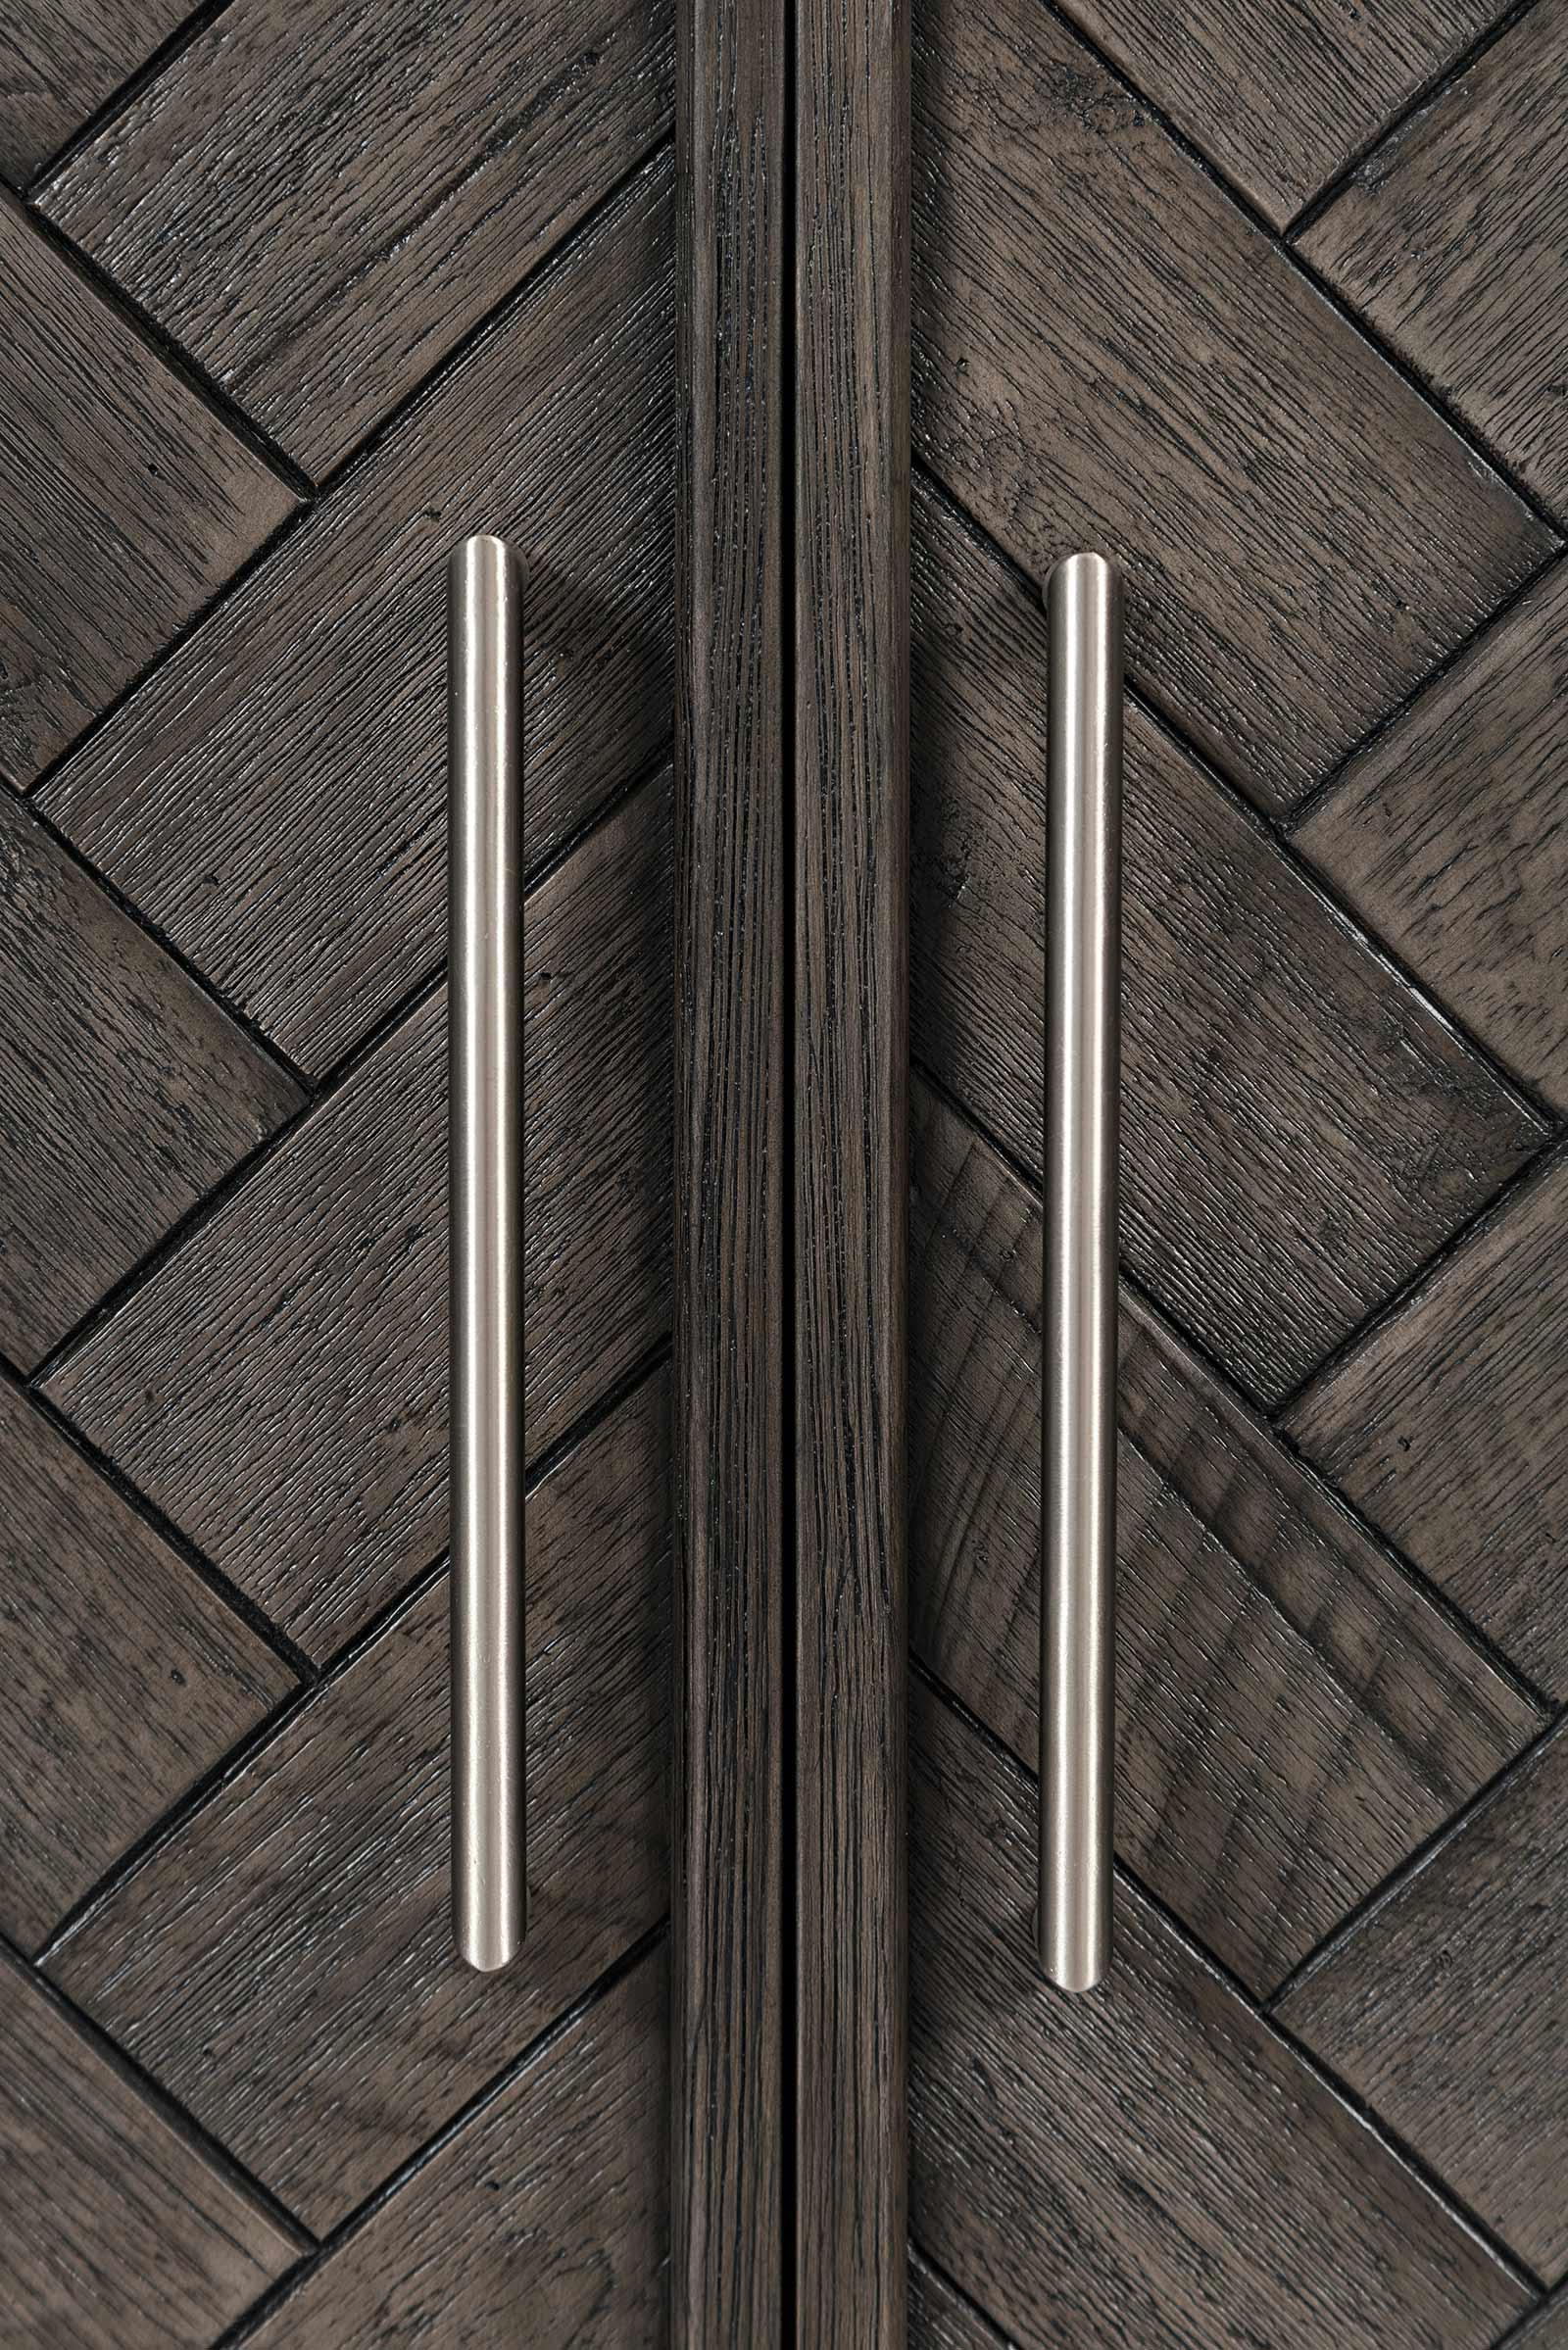 windham target langley andover cabinet garrett street threshold walden phoebe mills whitesburg door accent rosendale yearwood white pulaski glossy trisha table full size concrete